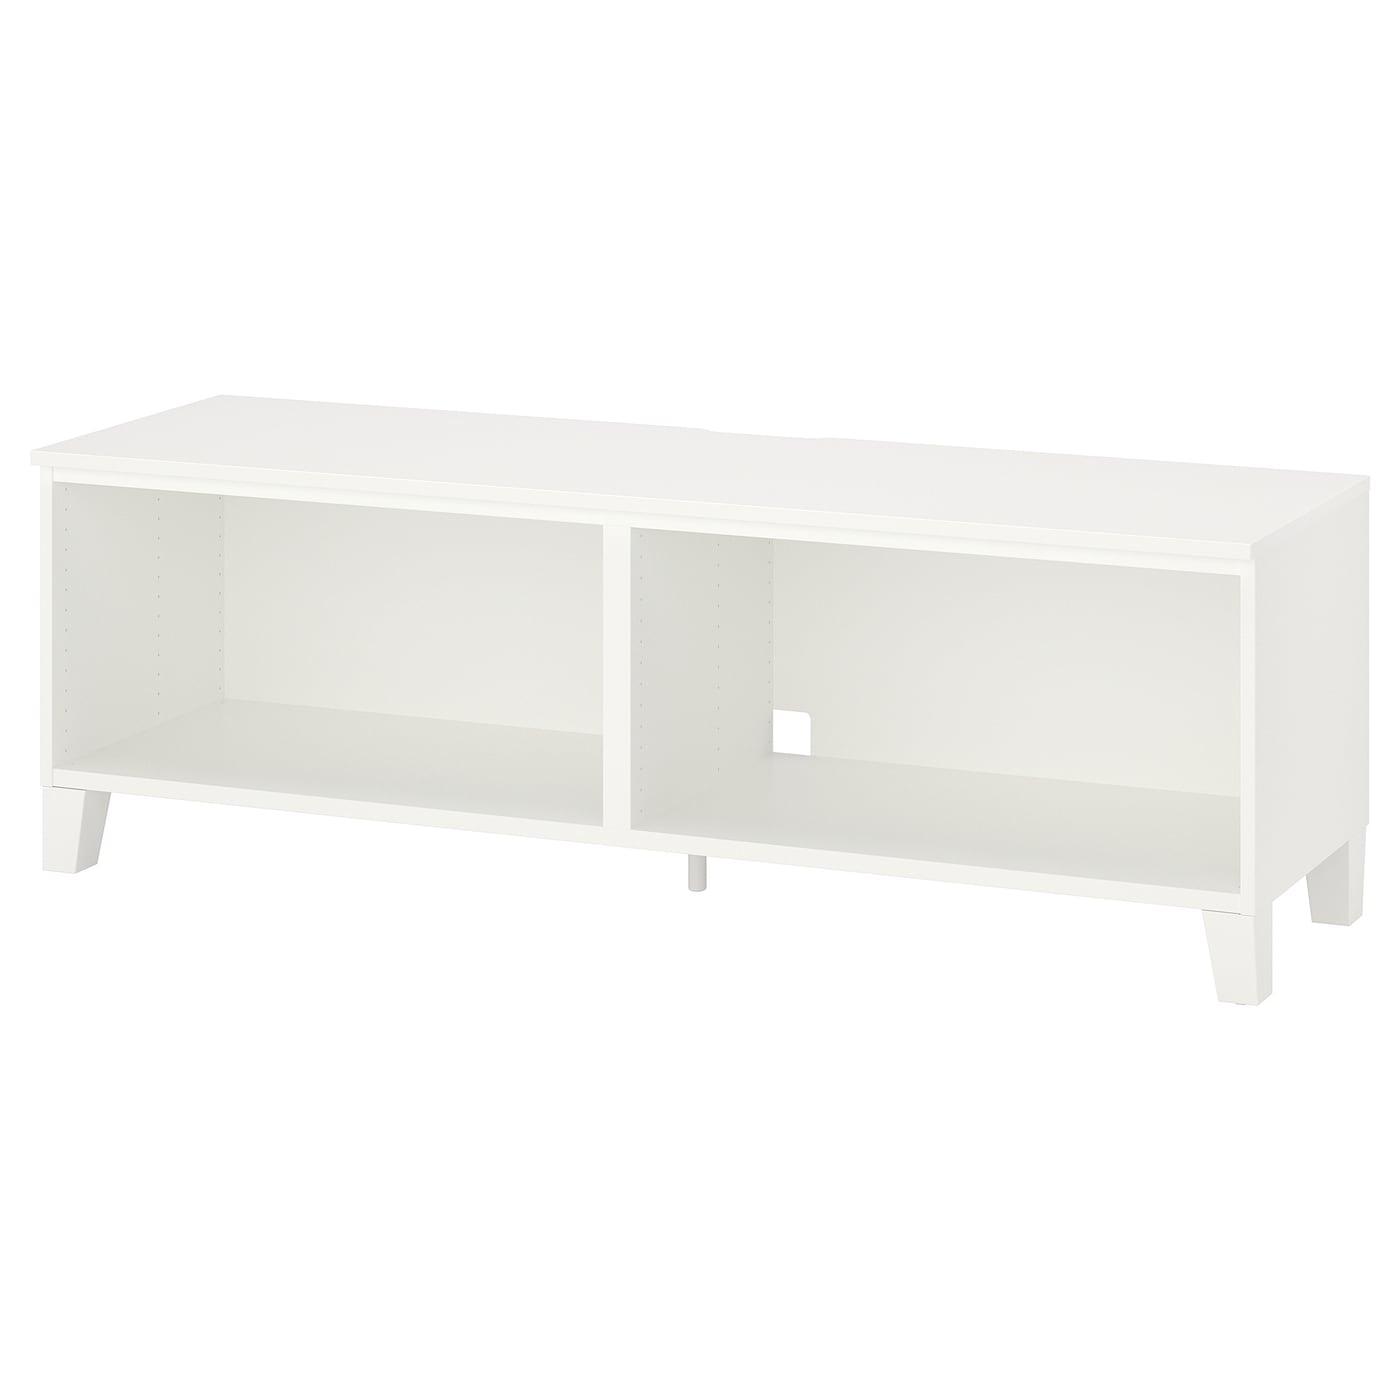 IKEA - PLATSA Tv-meubel - 160x42x53 cm - Wit/hout